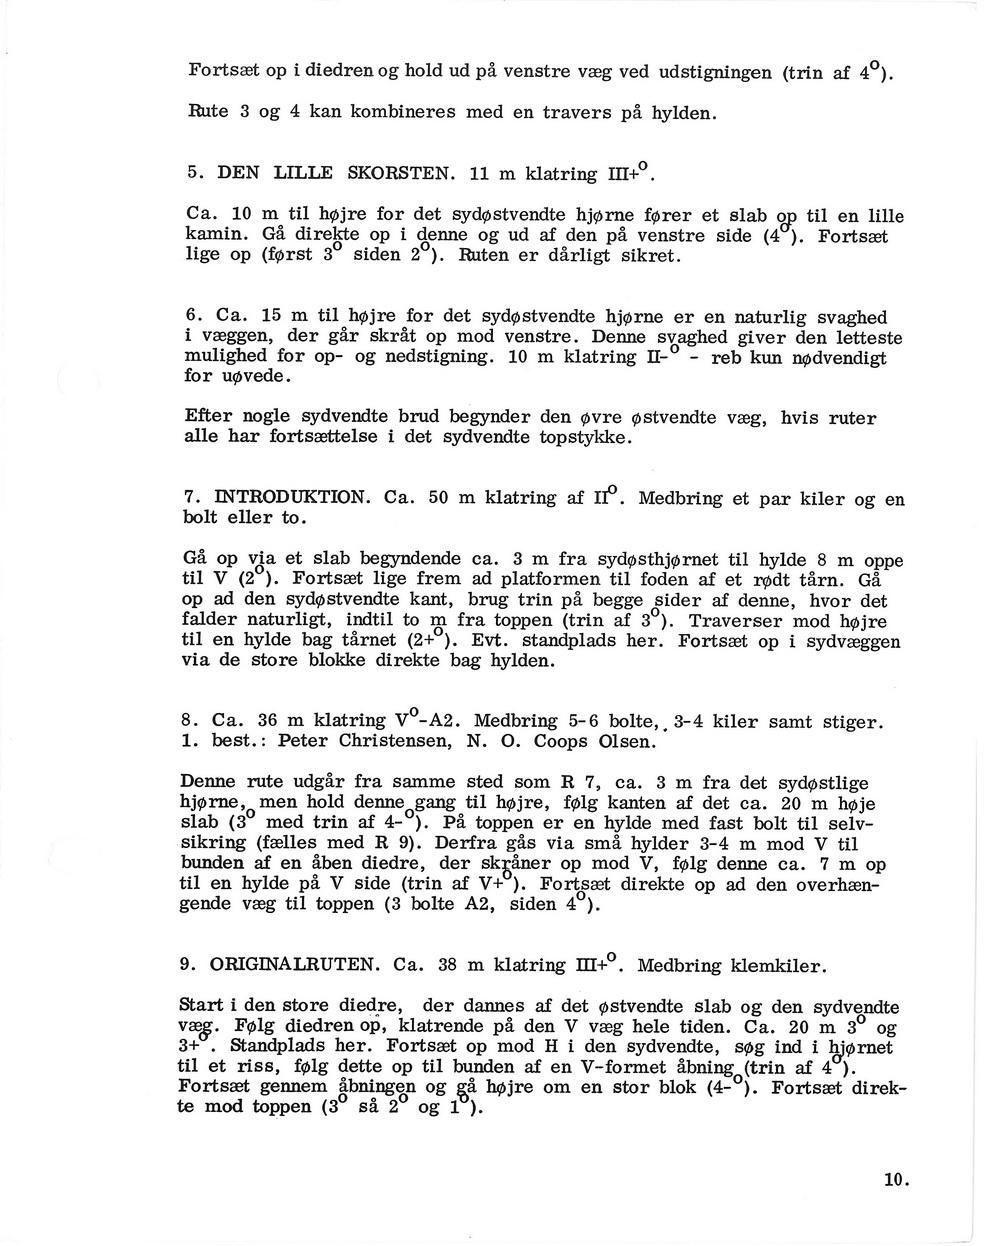 Kullen guide 1972 010.jpg